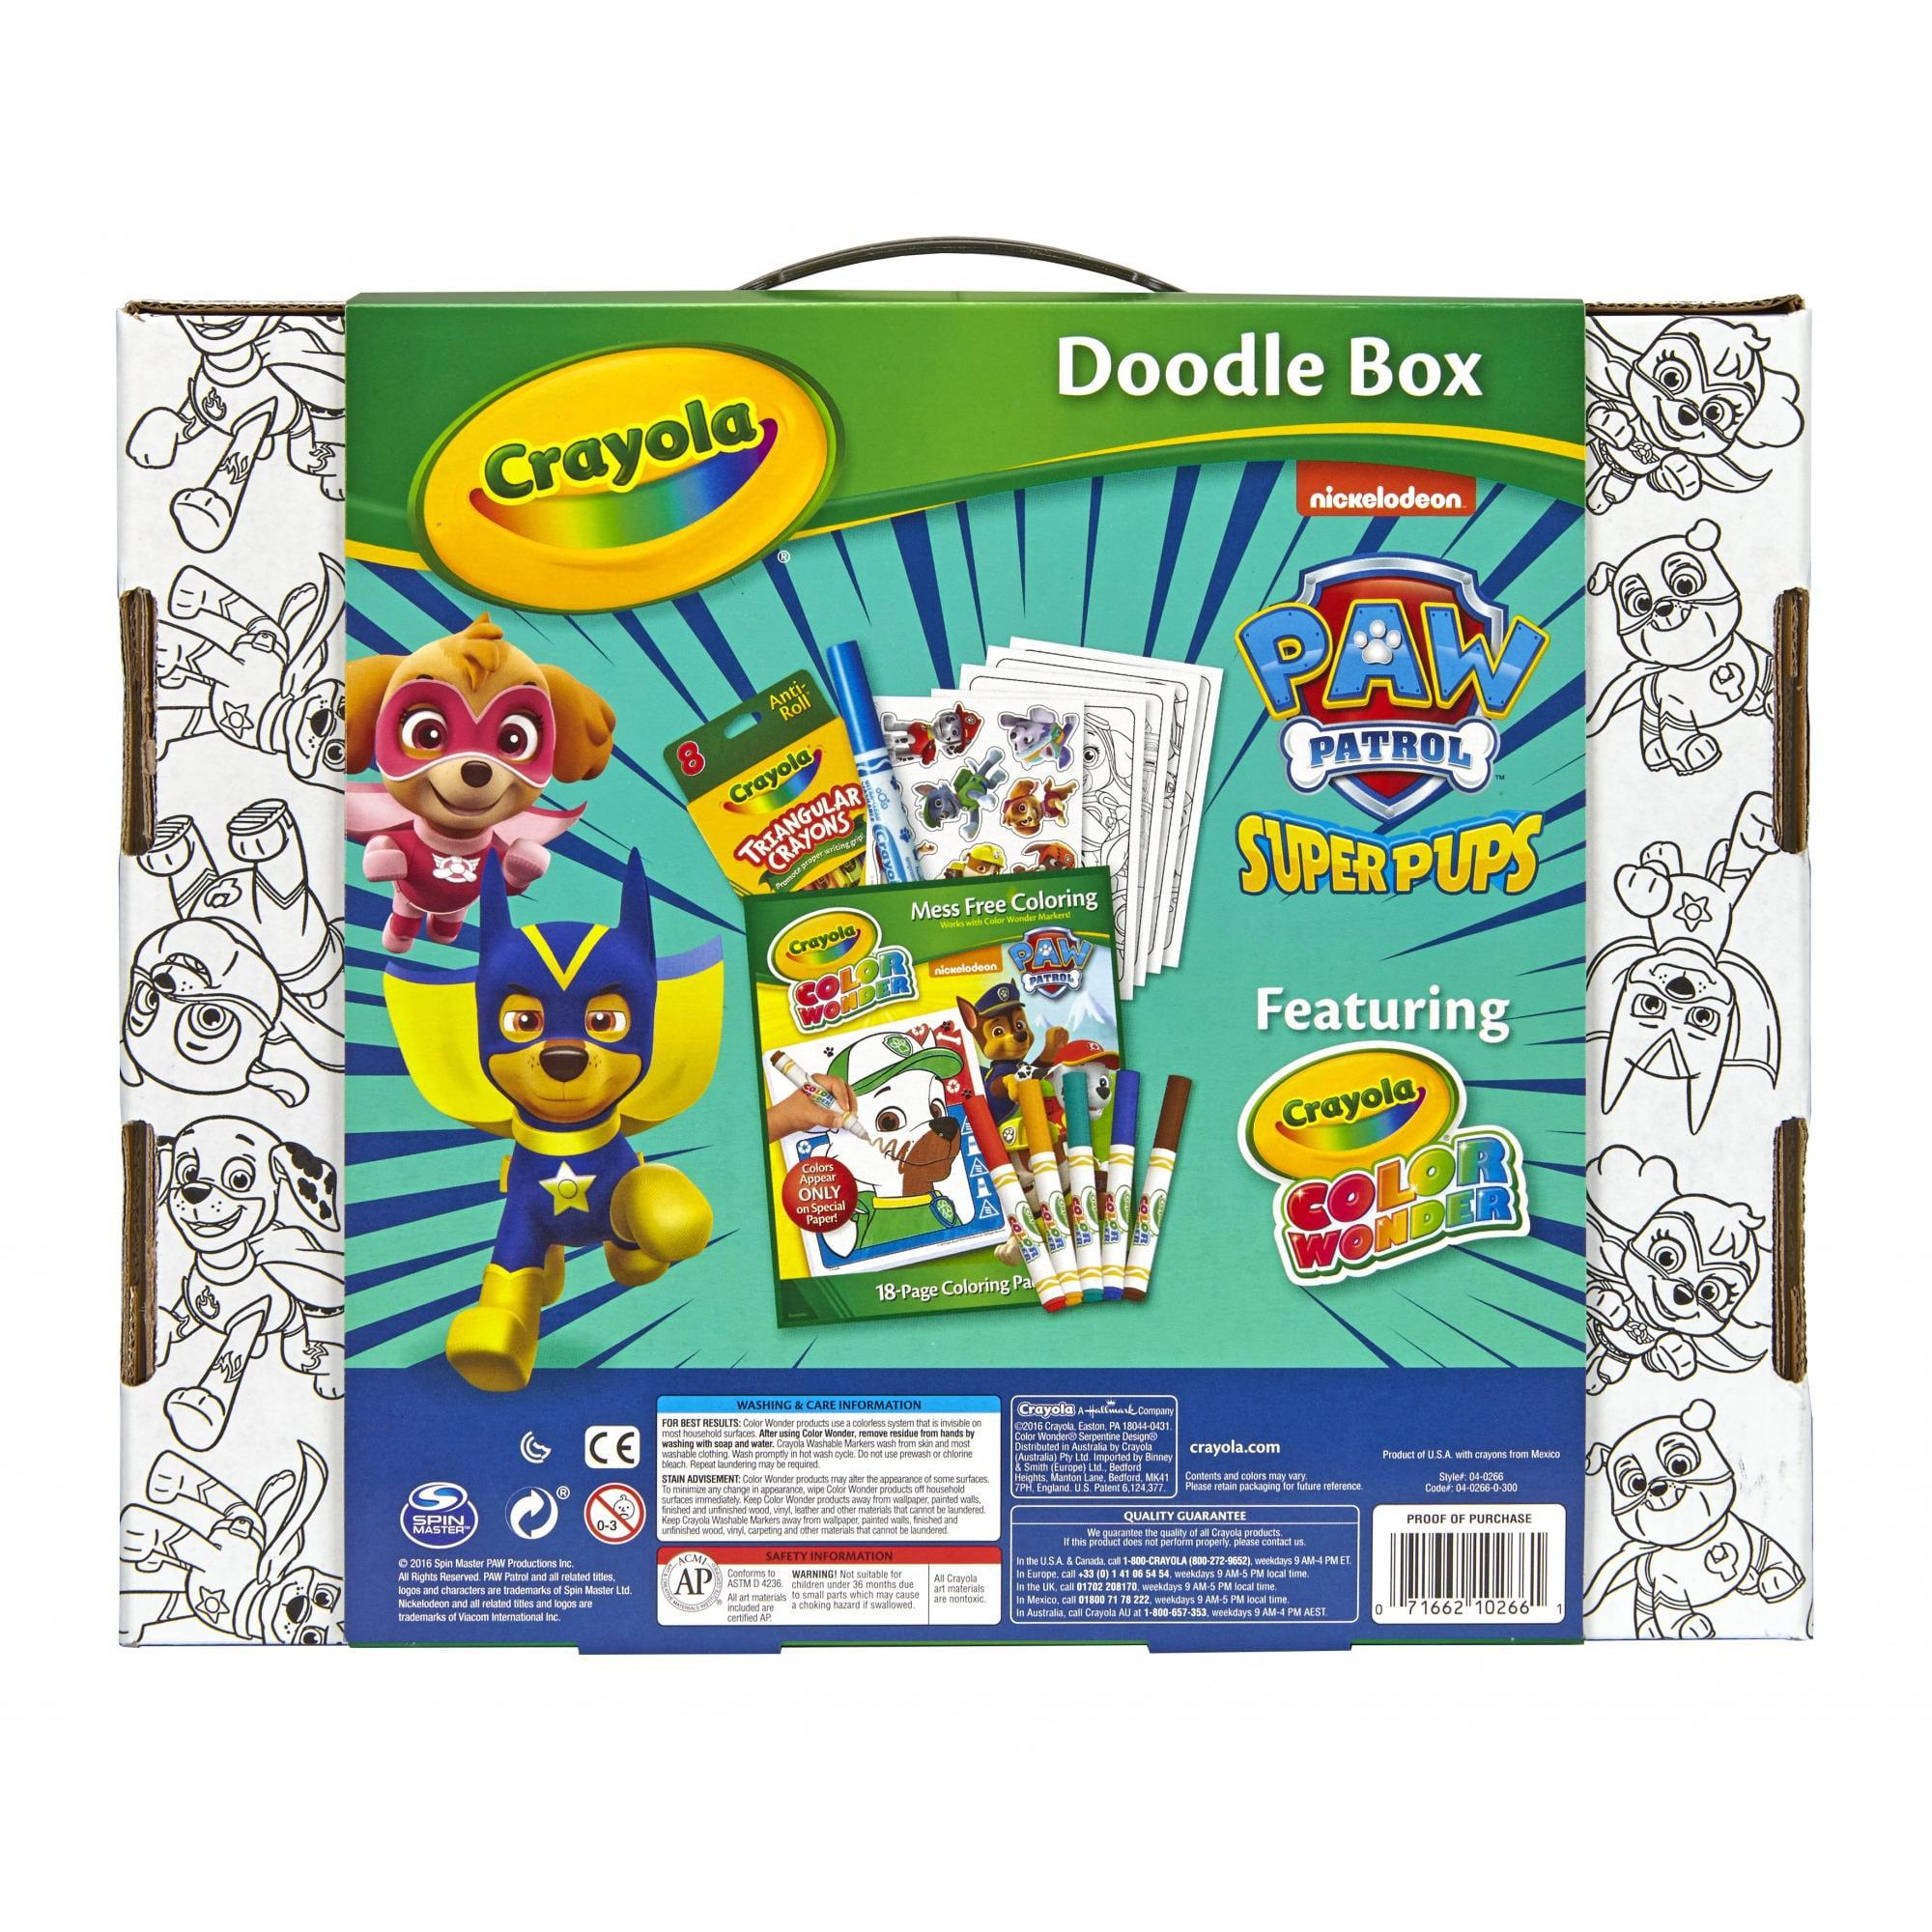 Coloring books for kids at walmart - Crayola Color Wonder Paw Patrol Superpups Doodle Box Art Kit Walmart Com